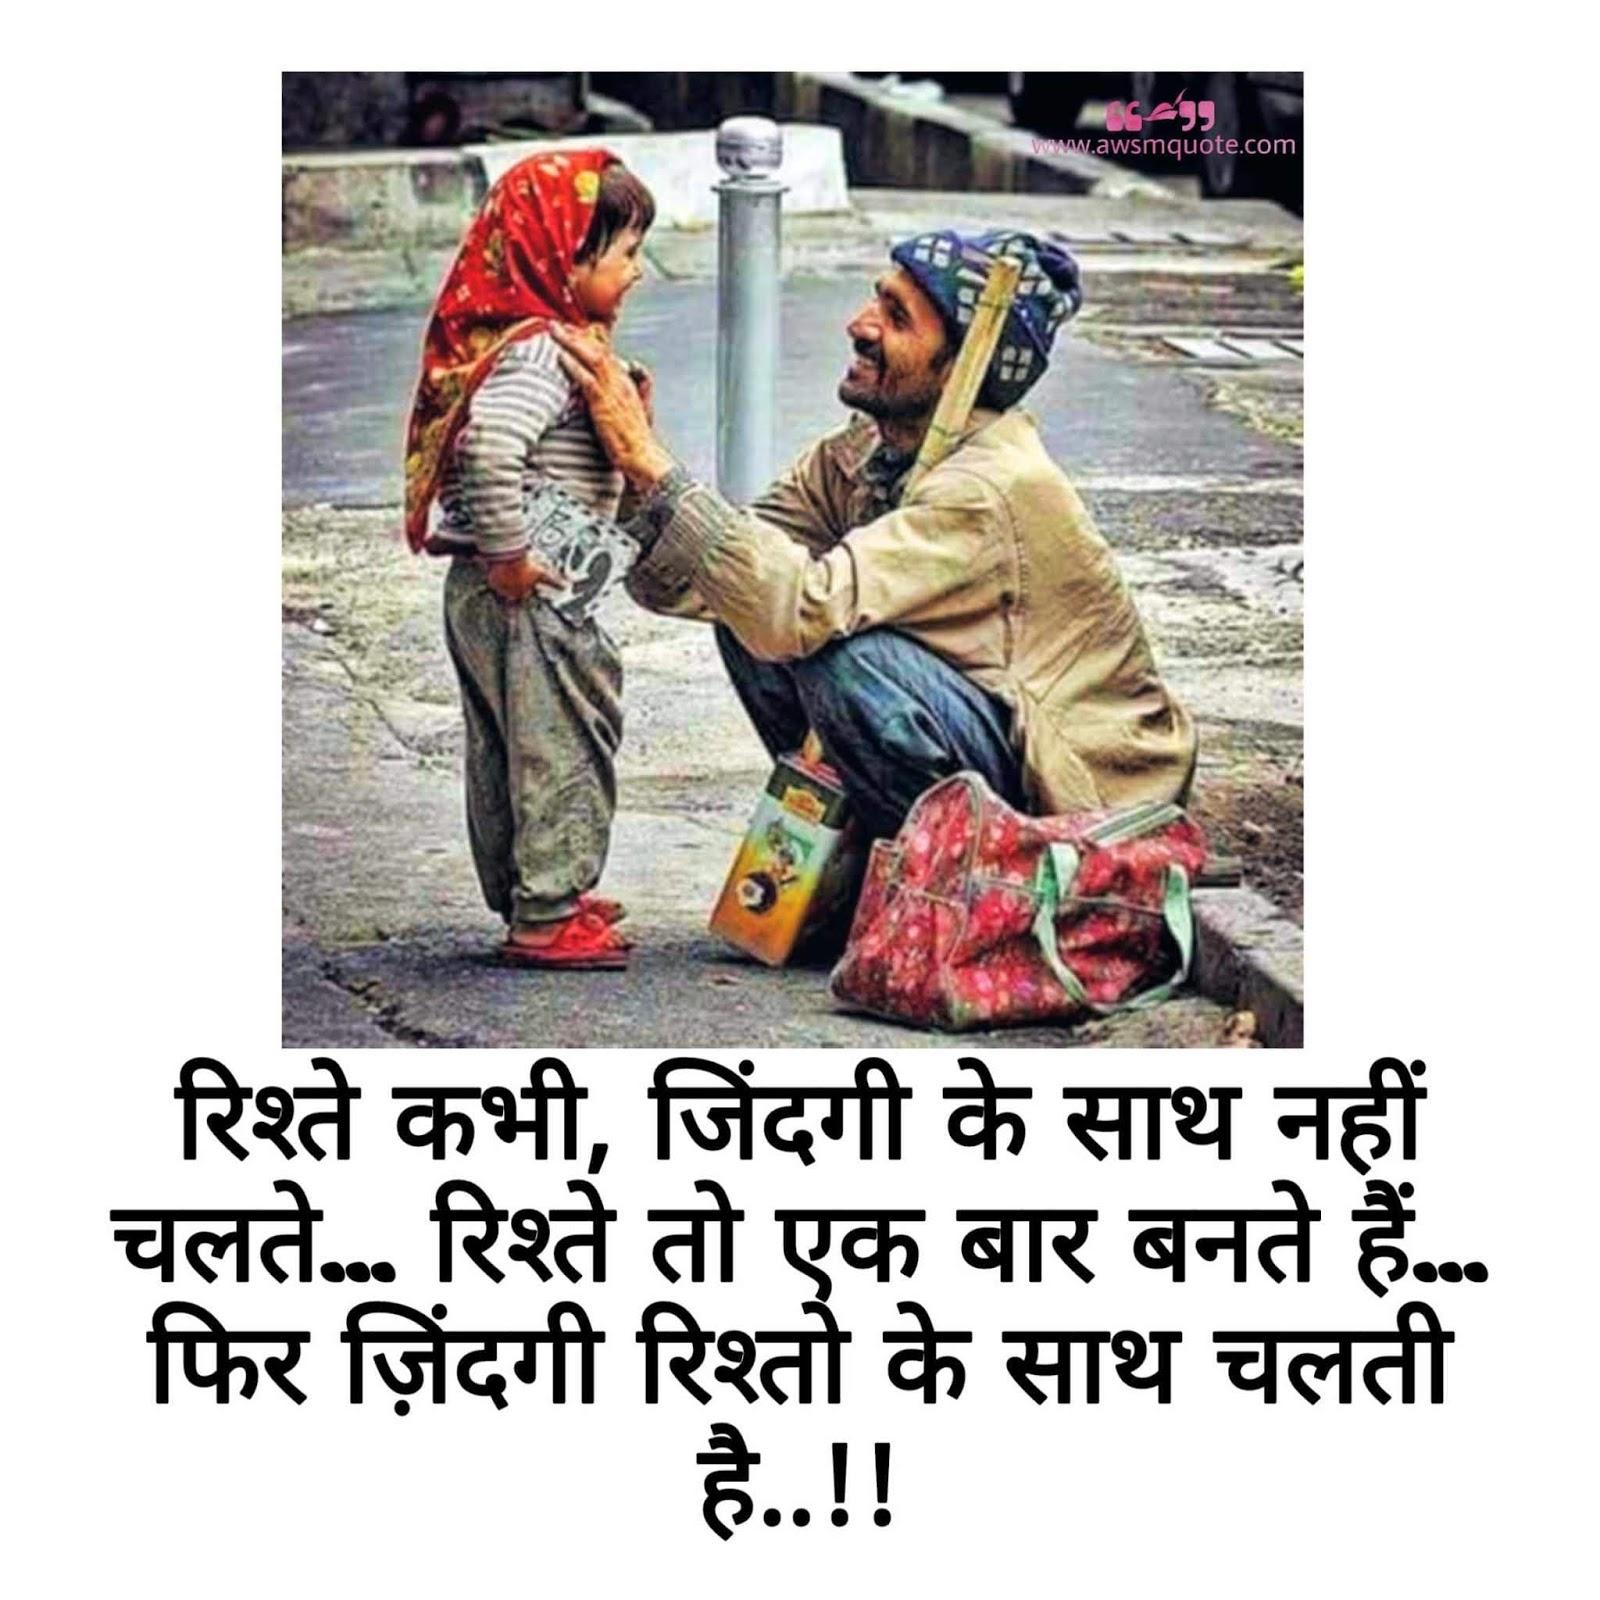 Top 15 Sad Romantic Hindi Shayari WhatsApp Status - 2020